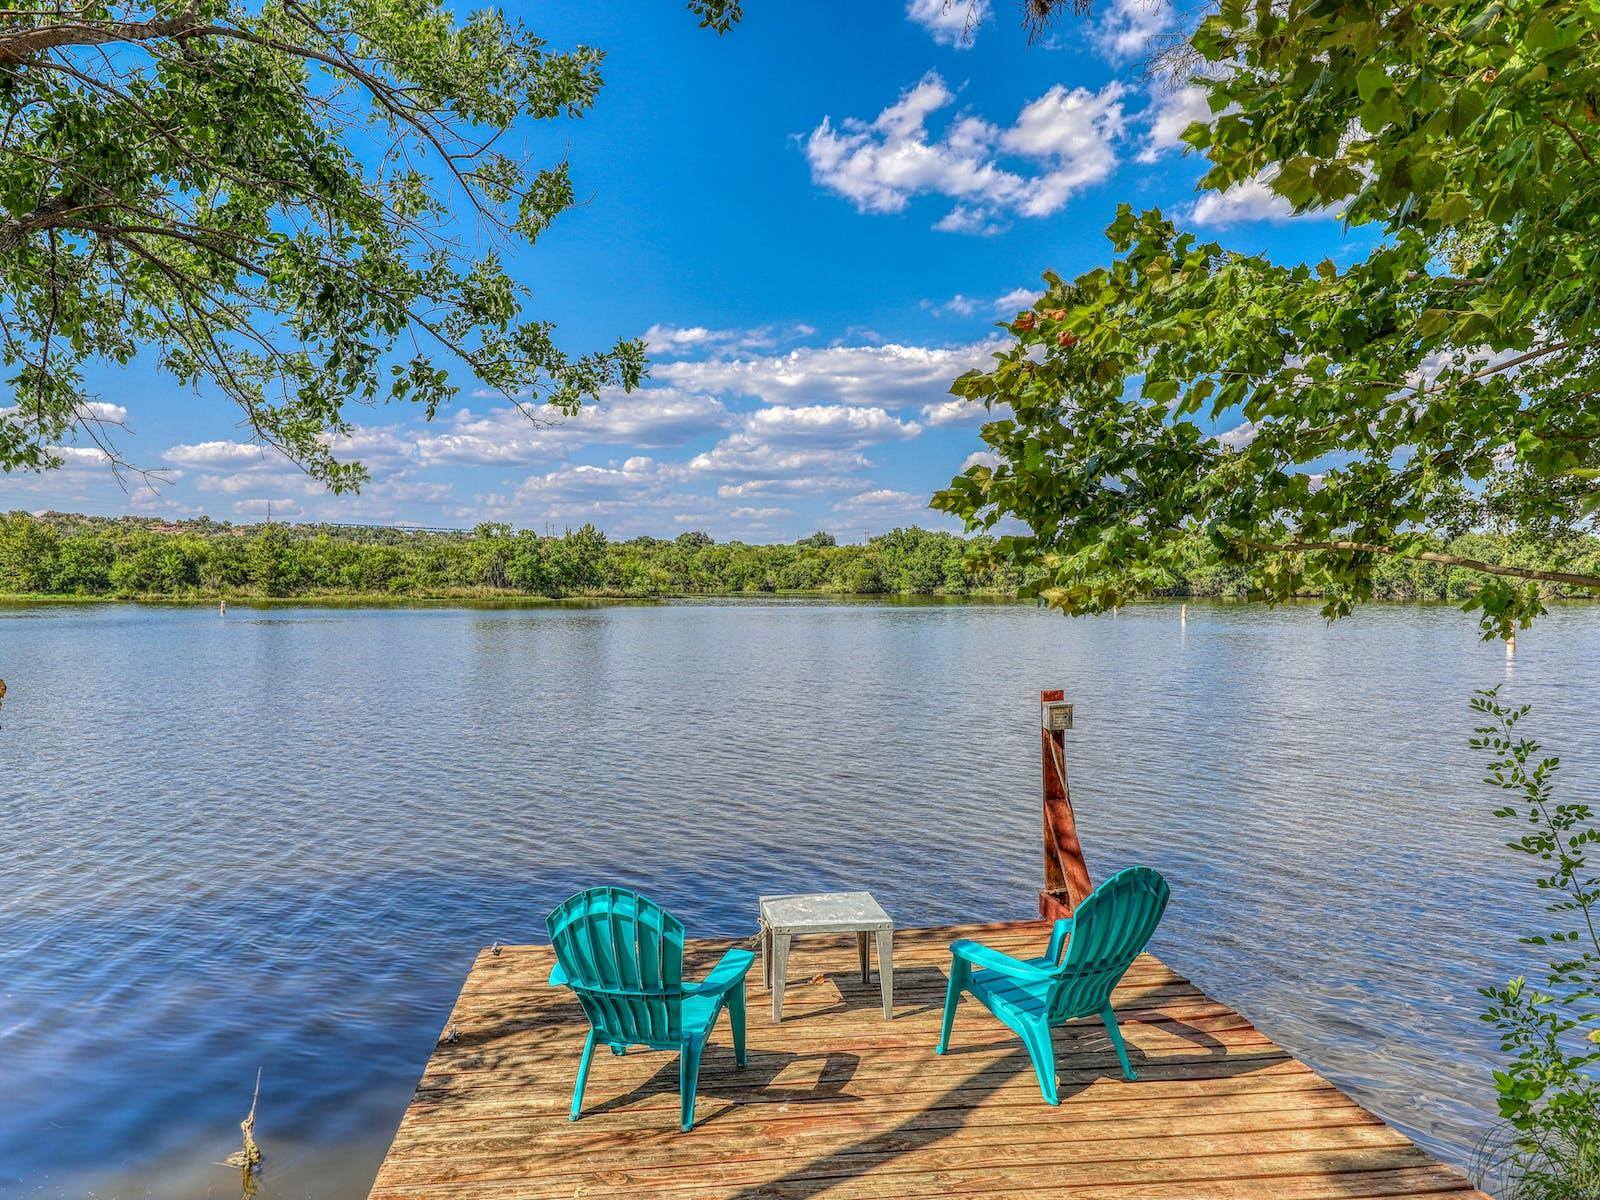 Vacation rental dock in Texas